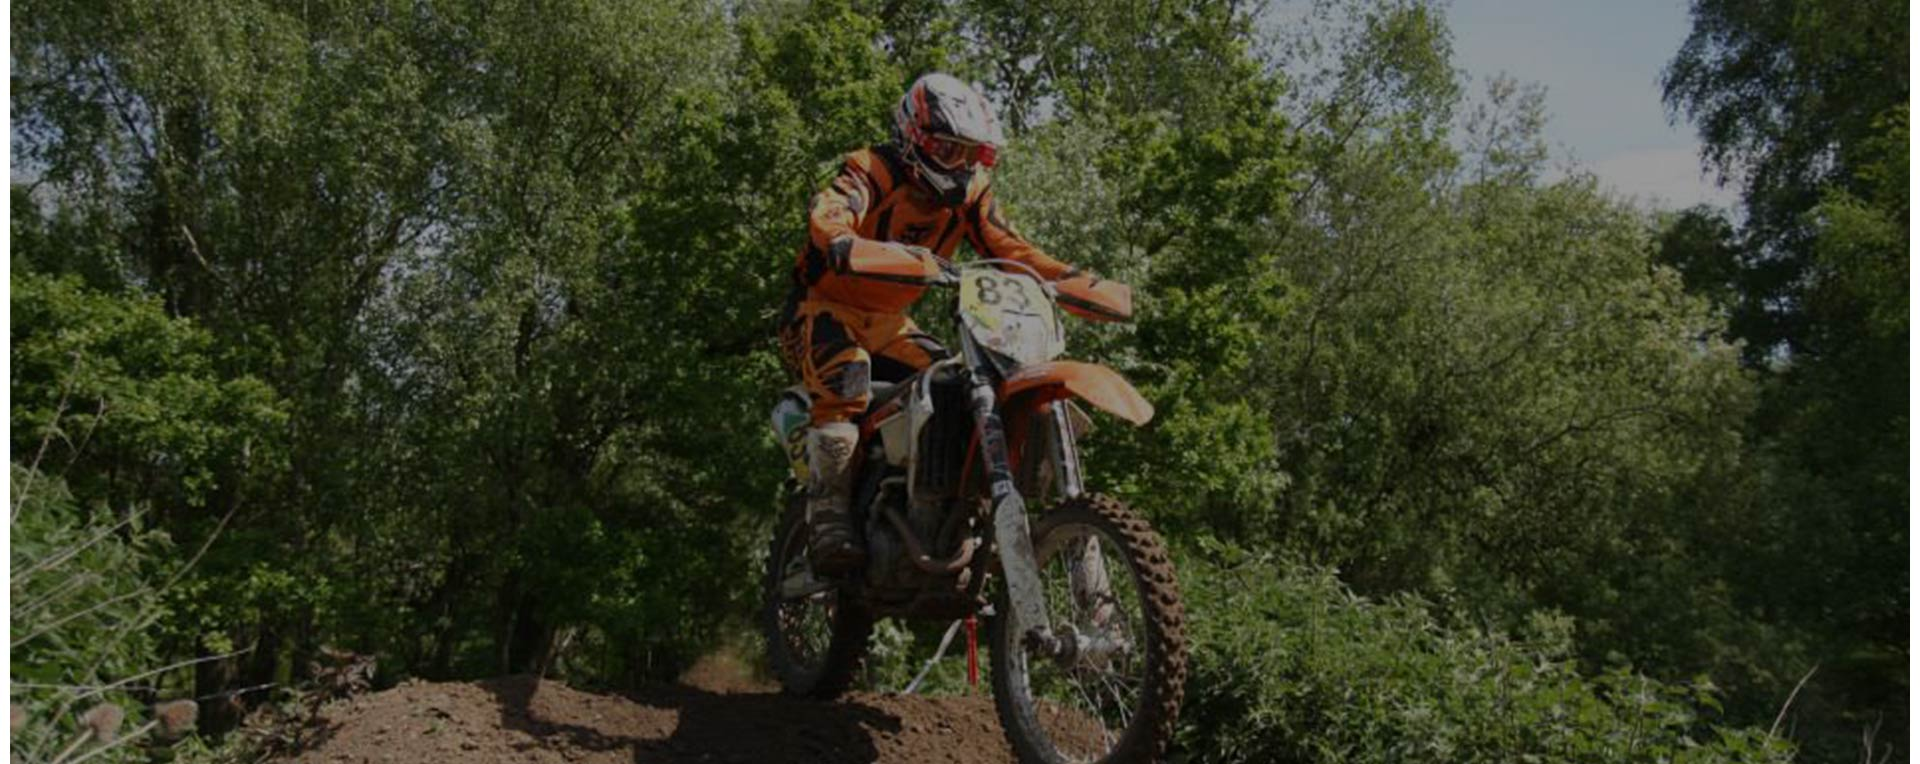 Sudbury Motorcycle Club